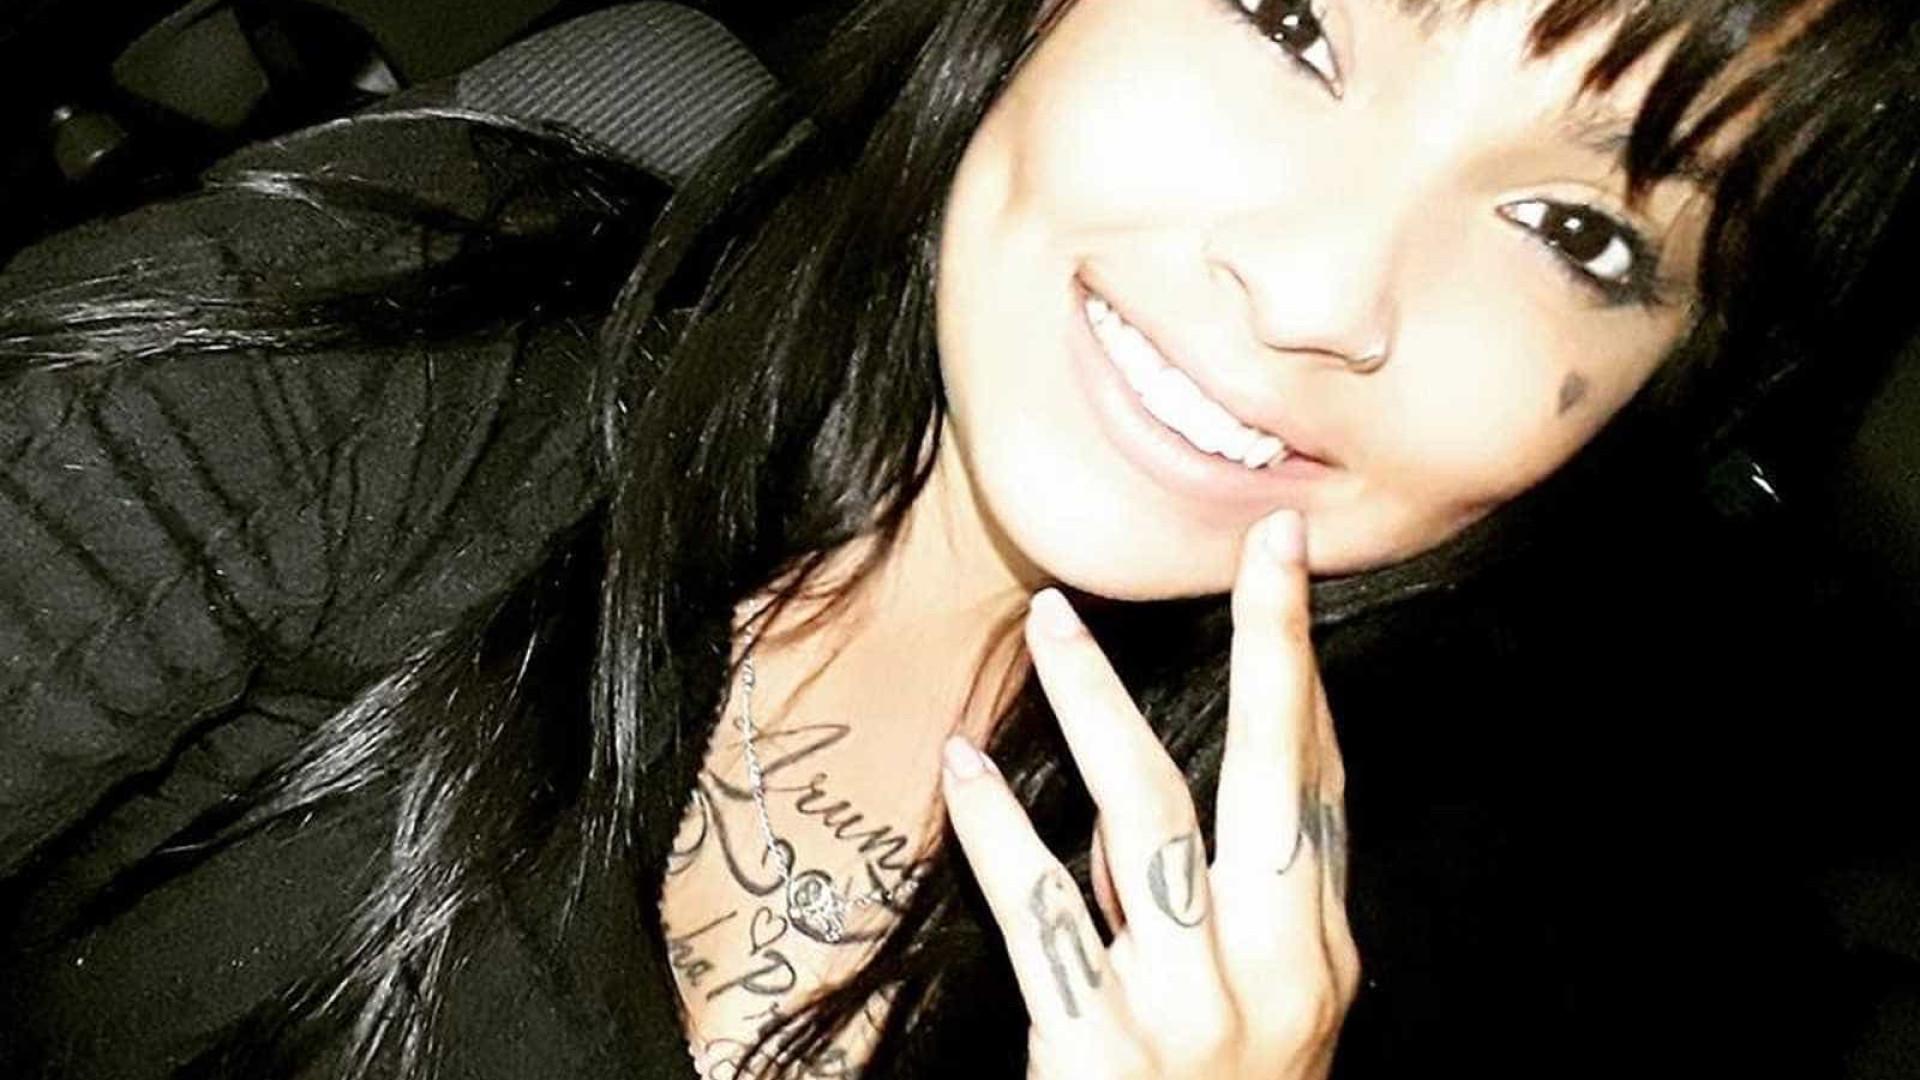 Jovem encontrada morta em Revéillon mencionou dívida em áudio